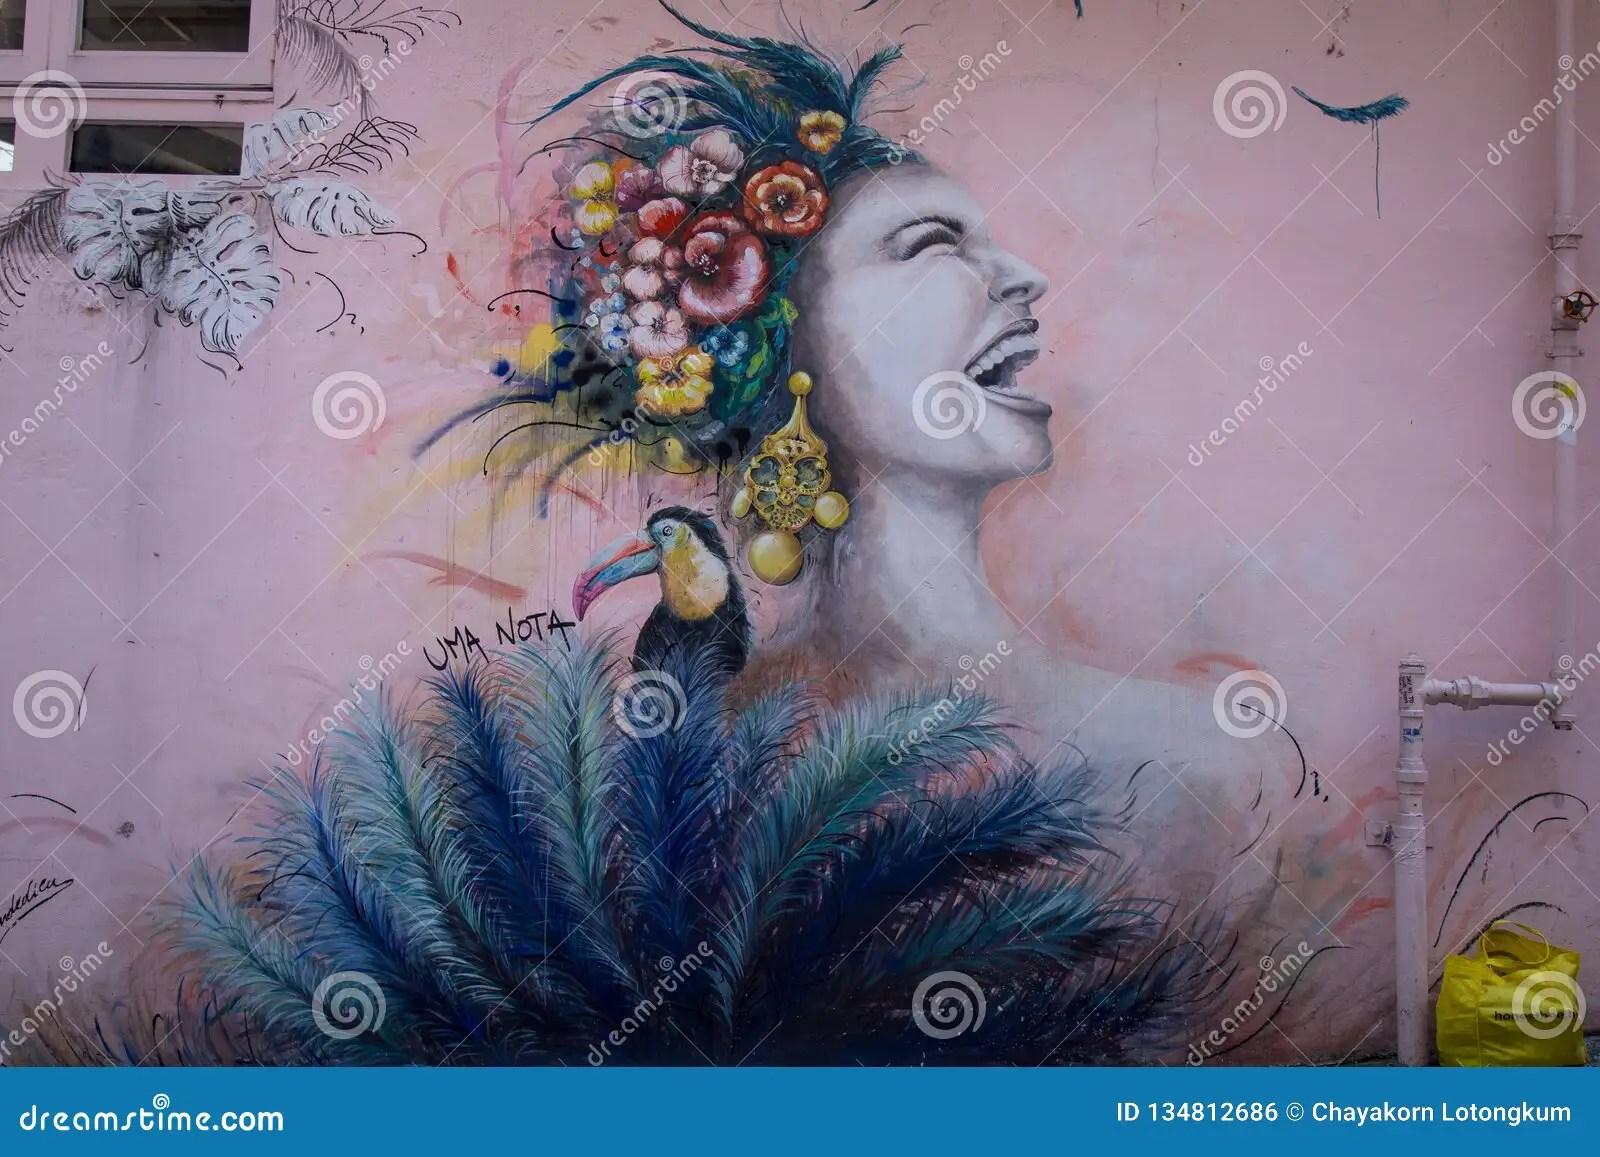 Graffiti Art In Central. Hong Kong Editorial Photo - Image of gutzlaff. artist: 134812686